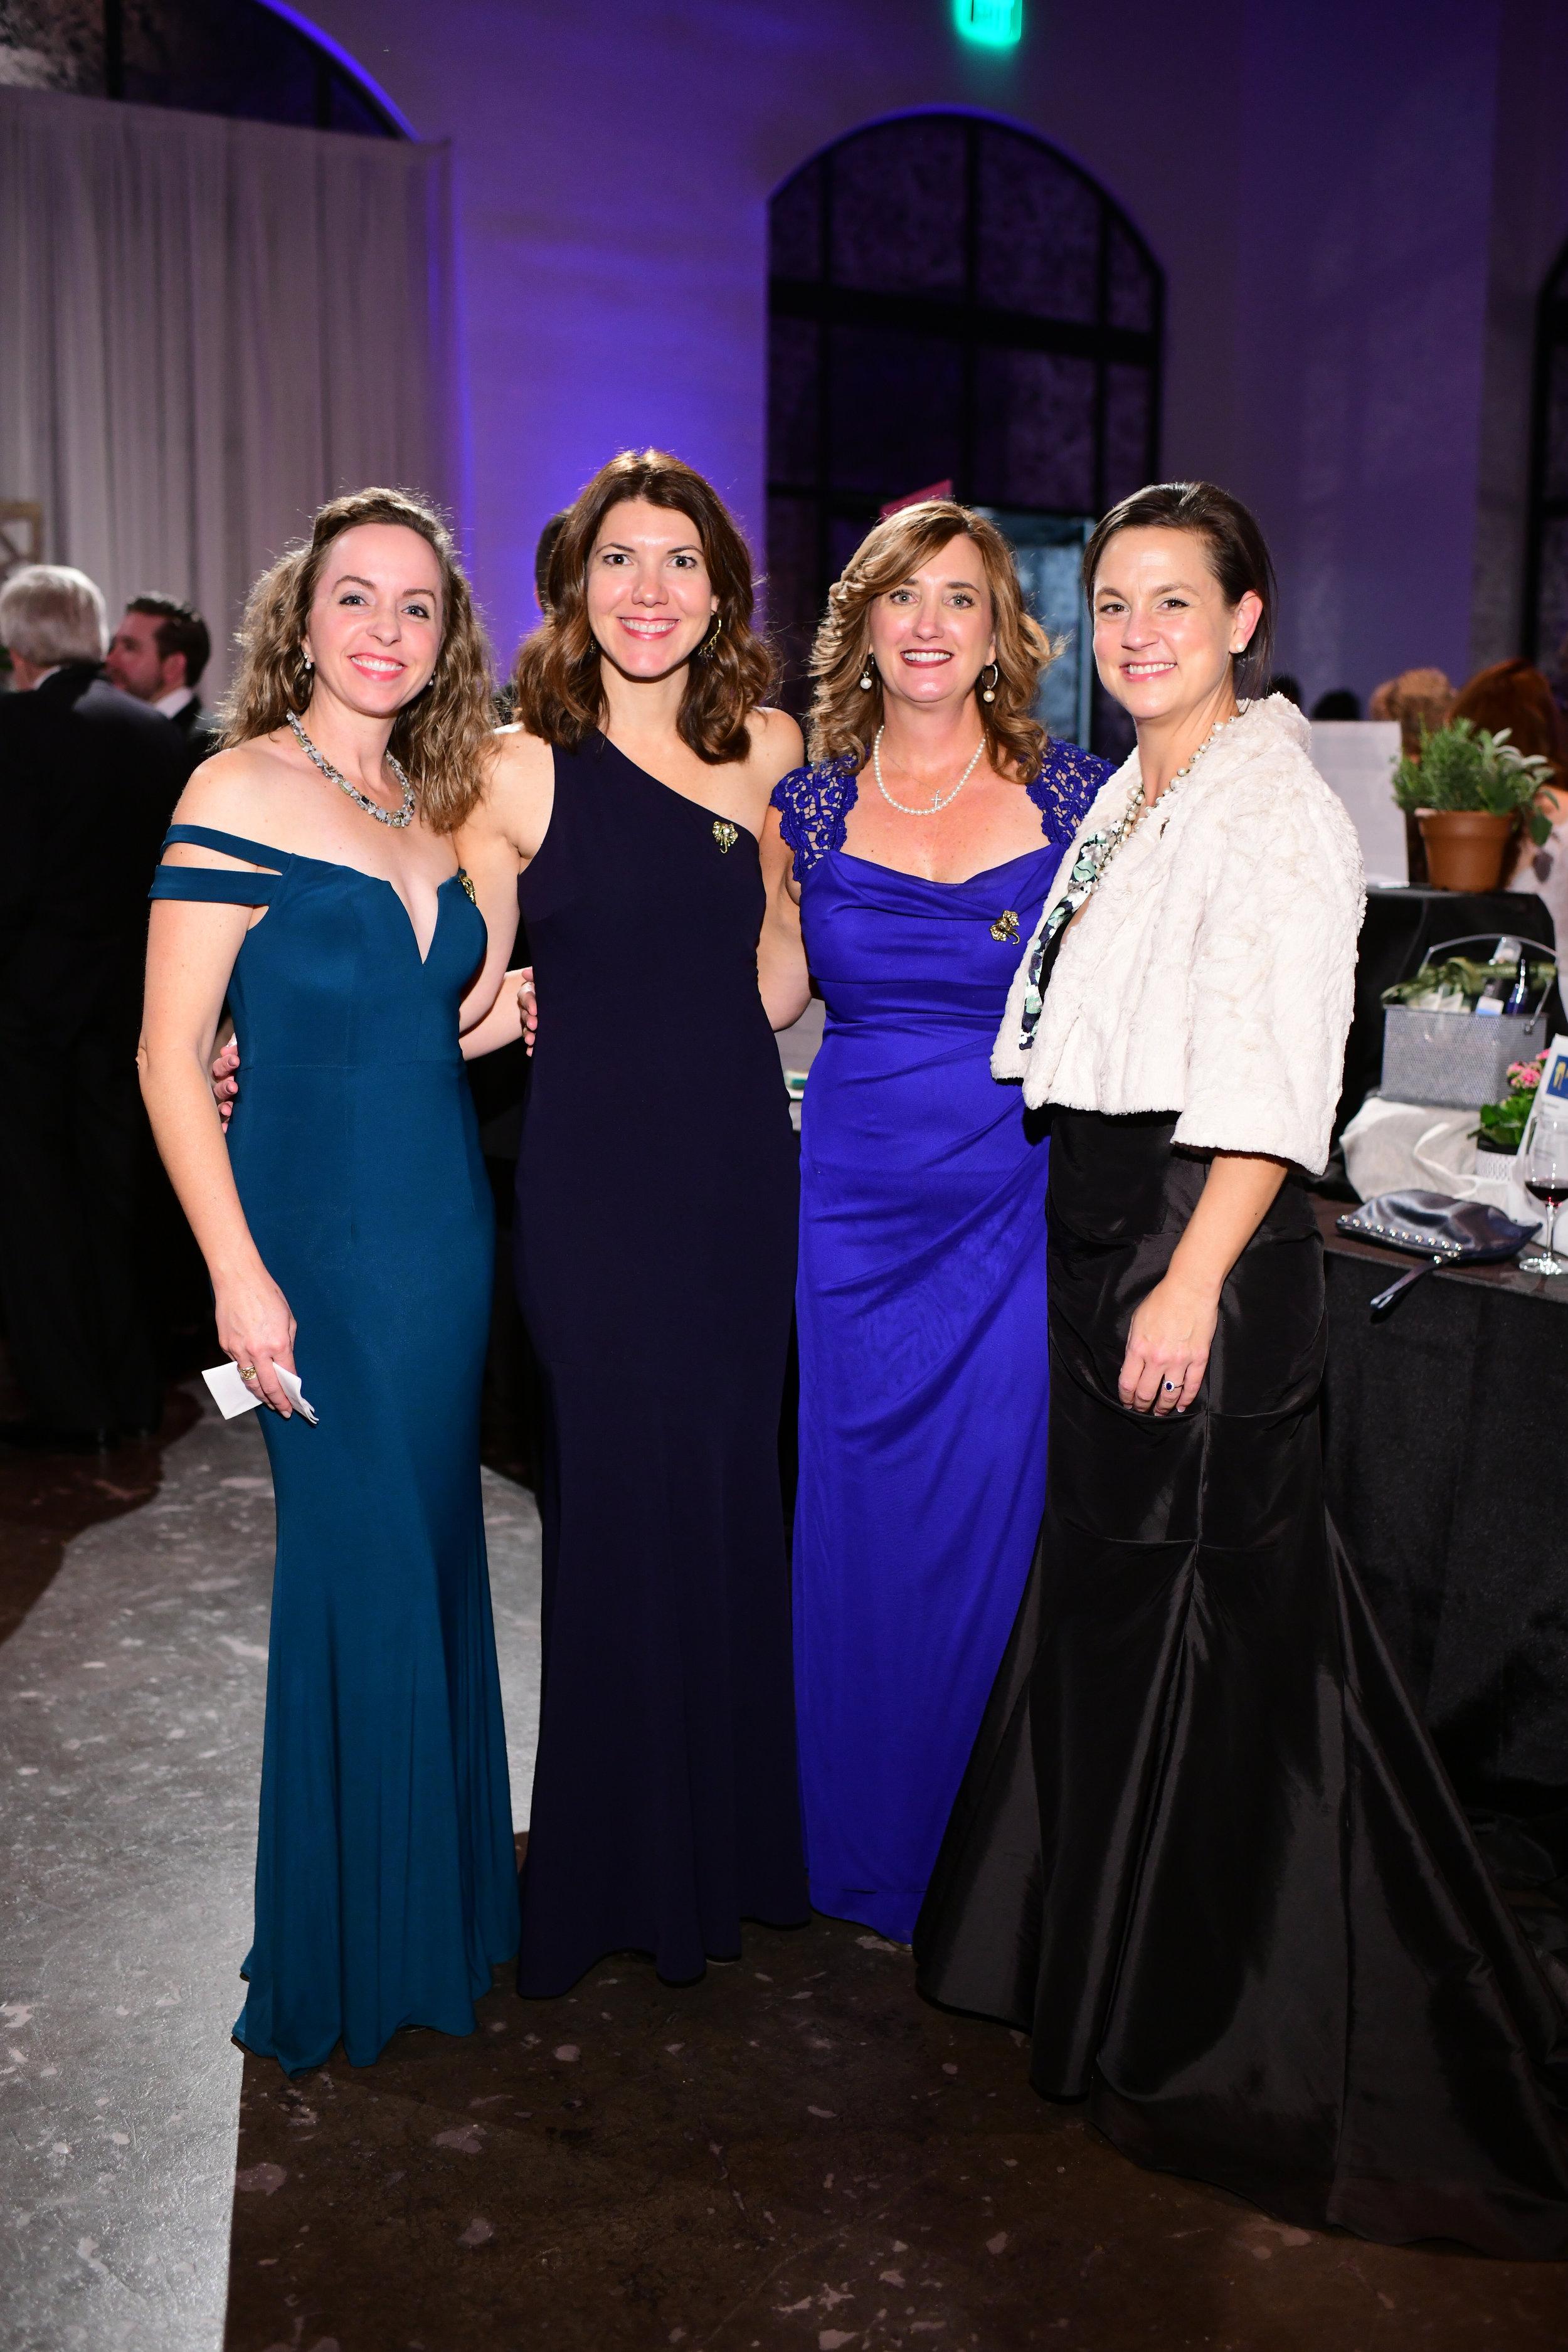 Catherine Shoaf, Marci Gray, Renee Ash, TK Harrison; Photo by Daniel Ortiz.jpg